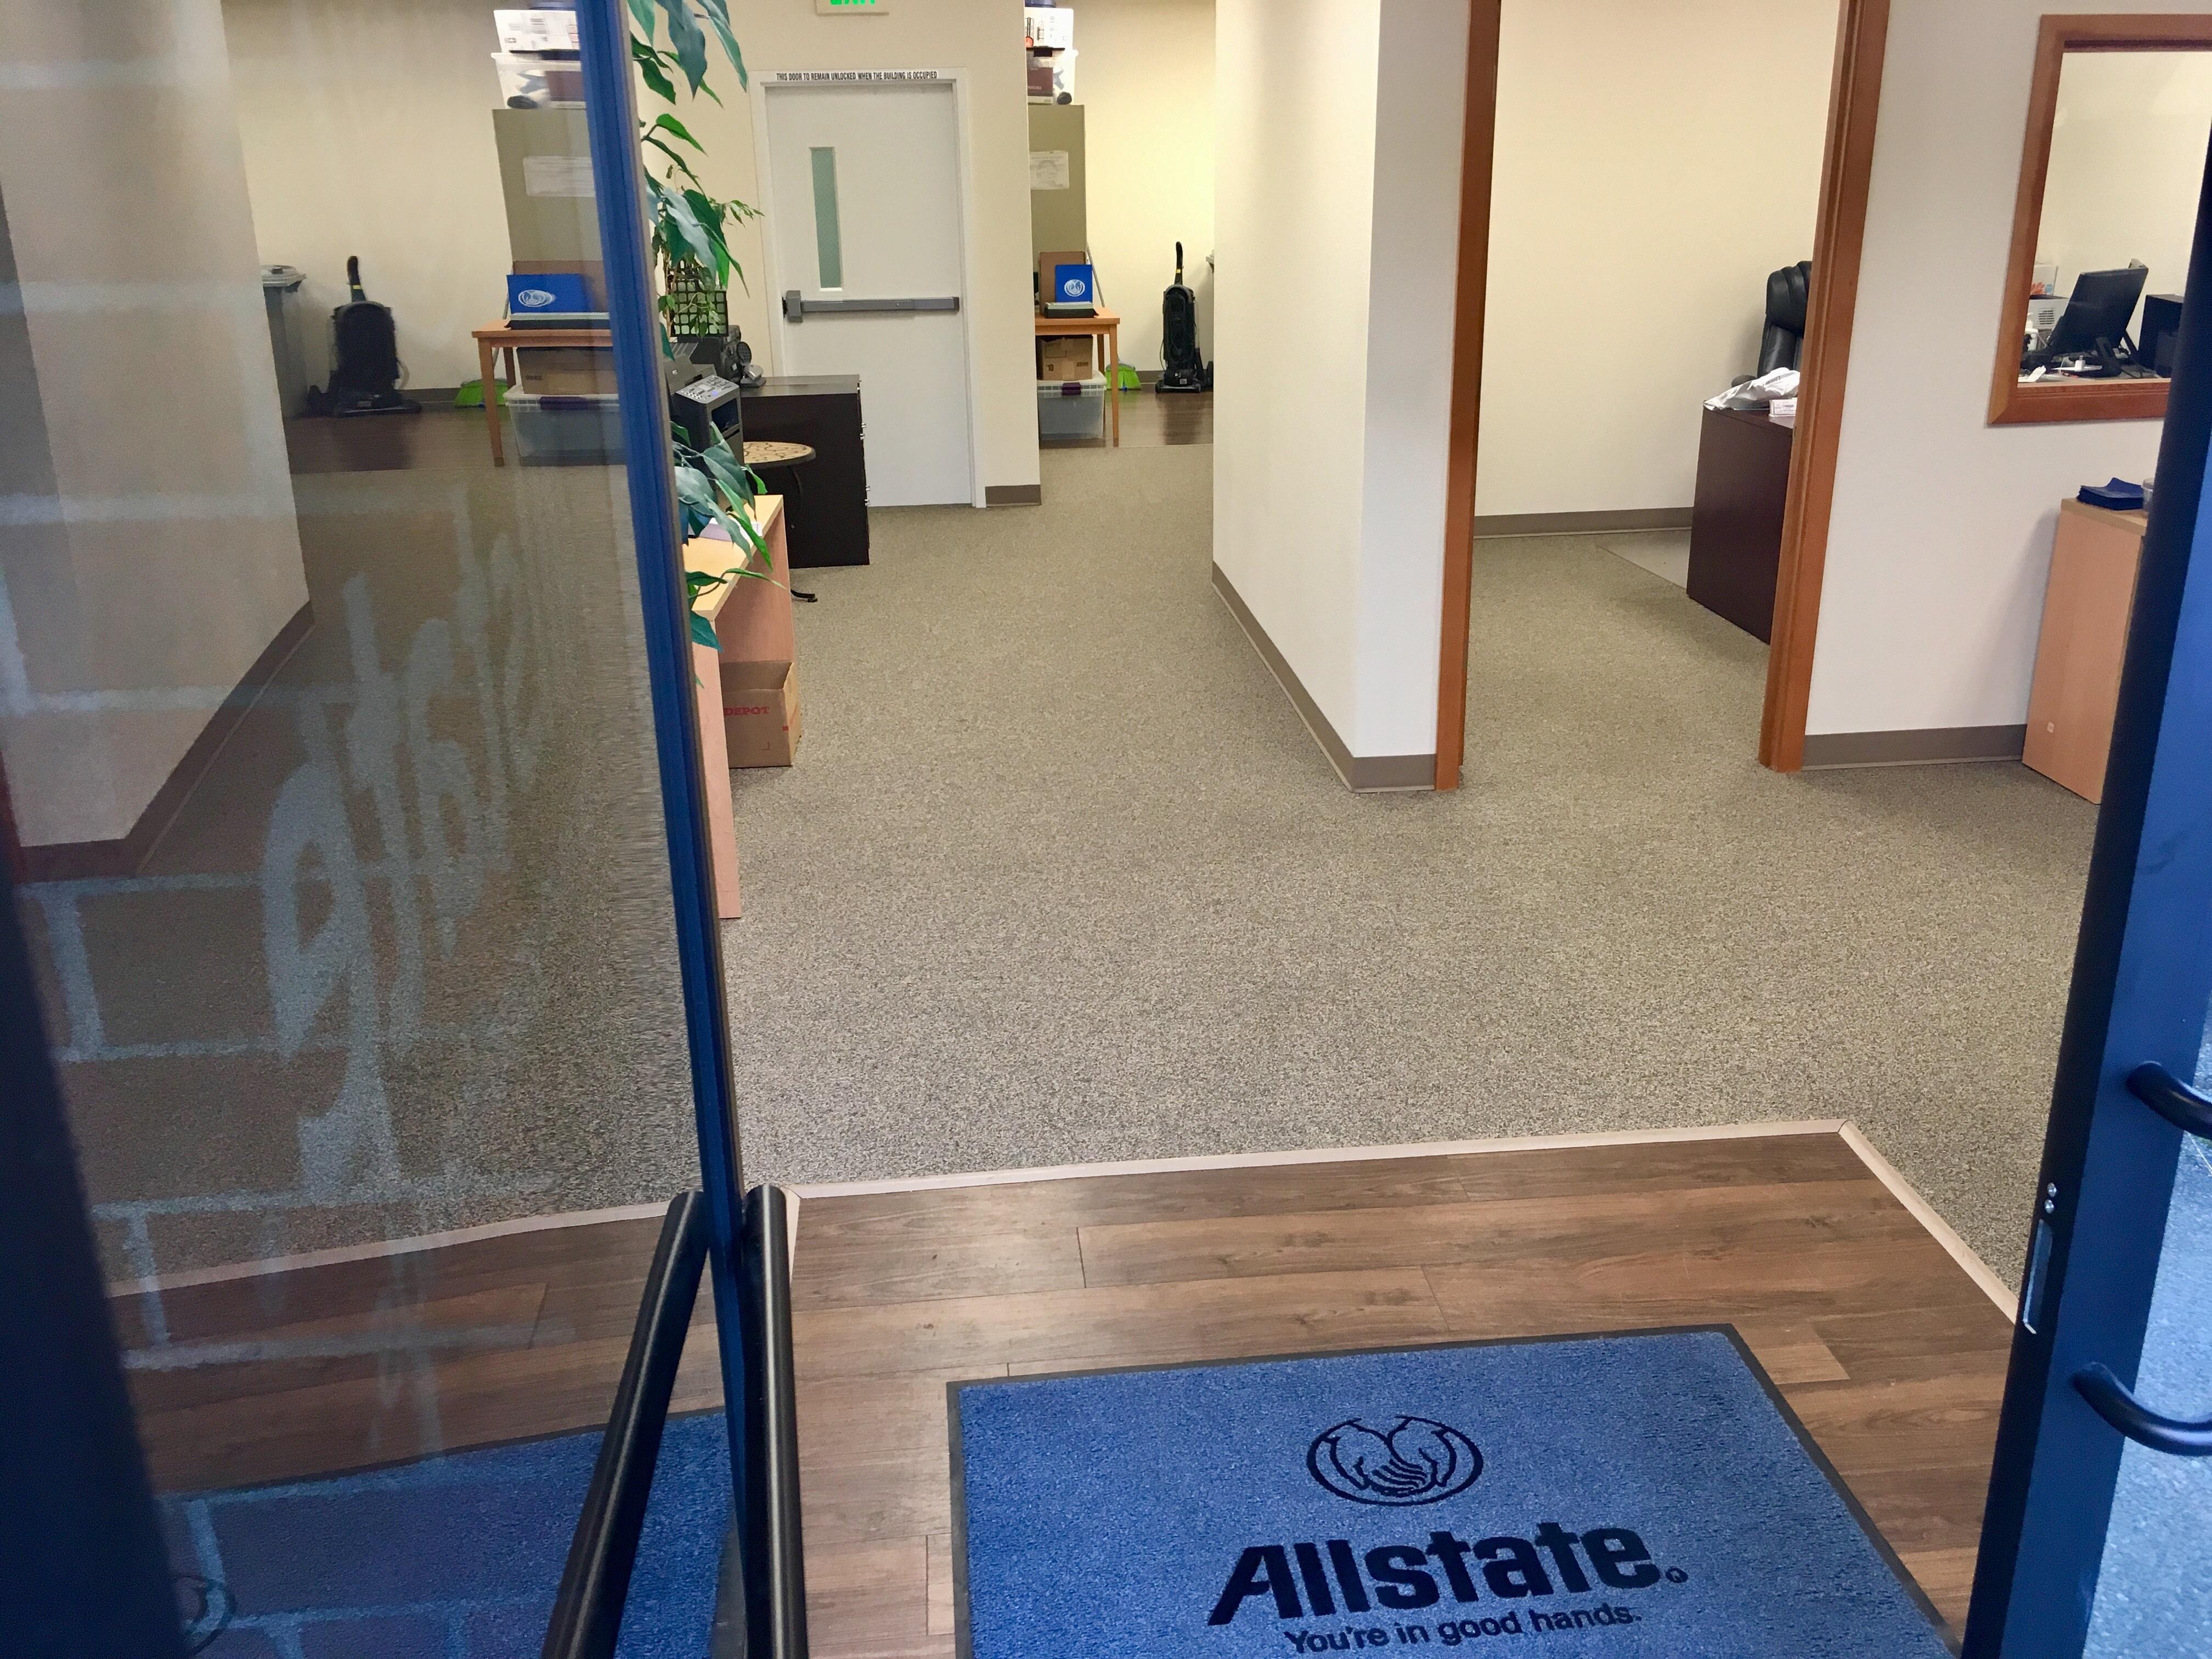 Larson Financial & Insurance: Allstate Insurance image 3